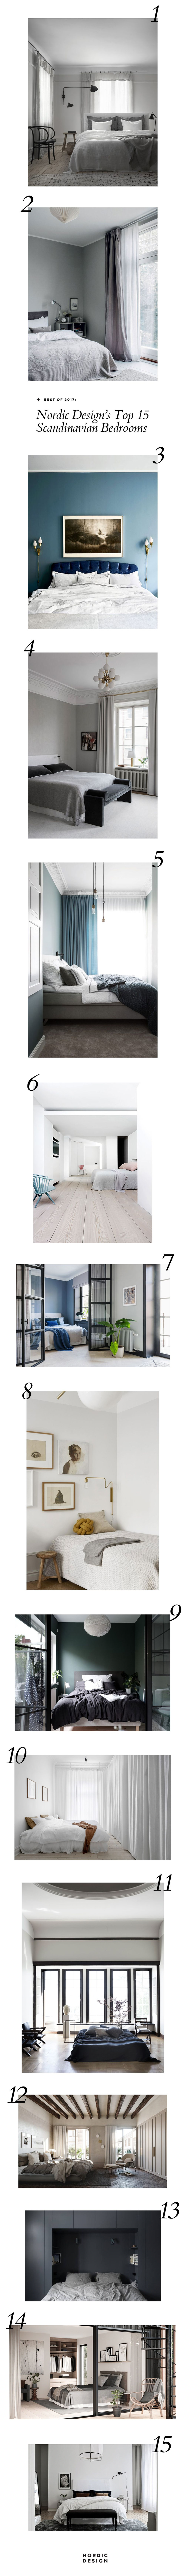 Best of 2017 Nordic Design's Top Bedrooms is part of Scandinavian bedroom Nordic - Some of the most dreamy bedrooms featured on the blog last year